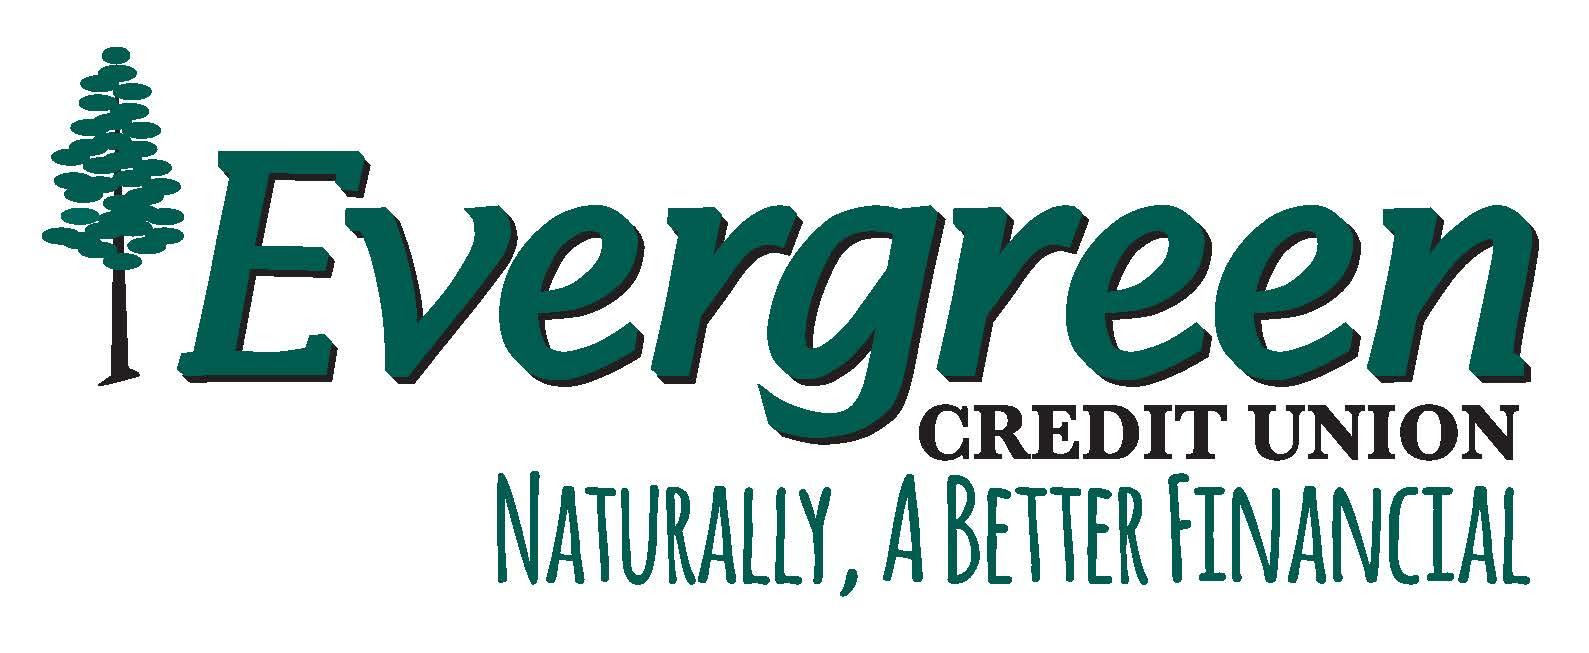 EvergreenLogo_FullColor_WithTagline eps.jpg